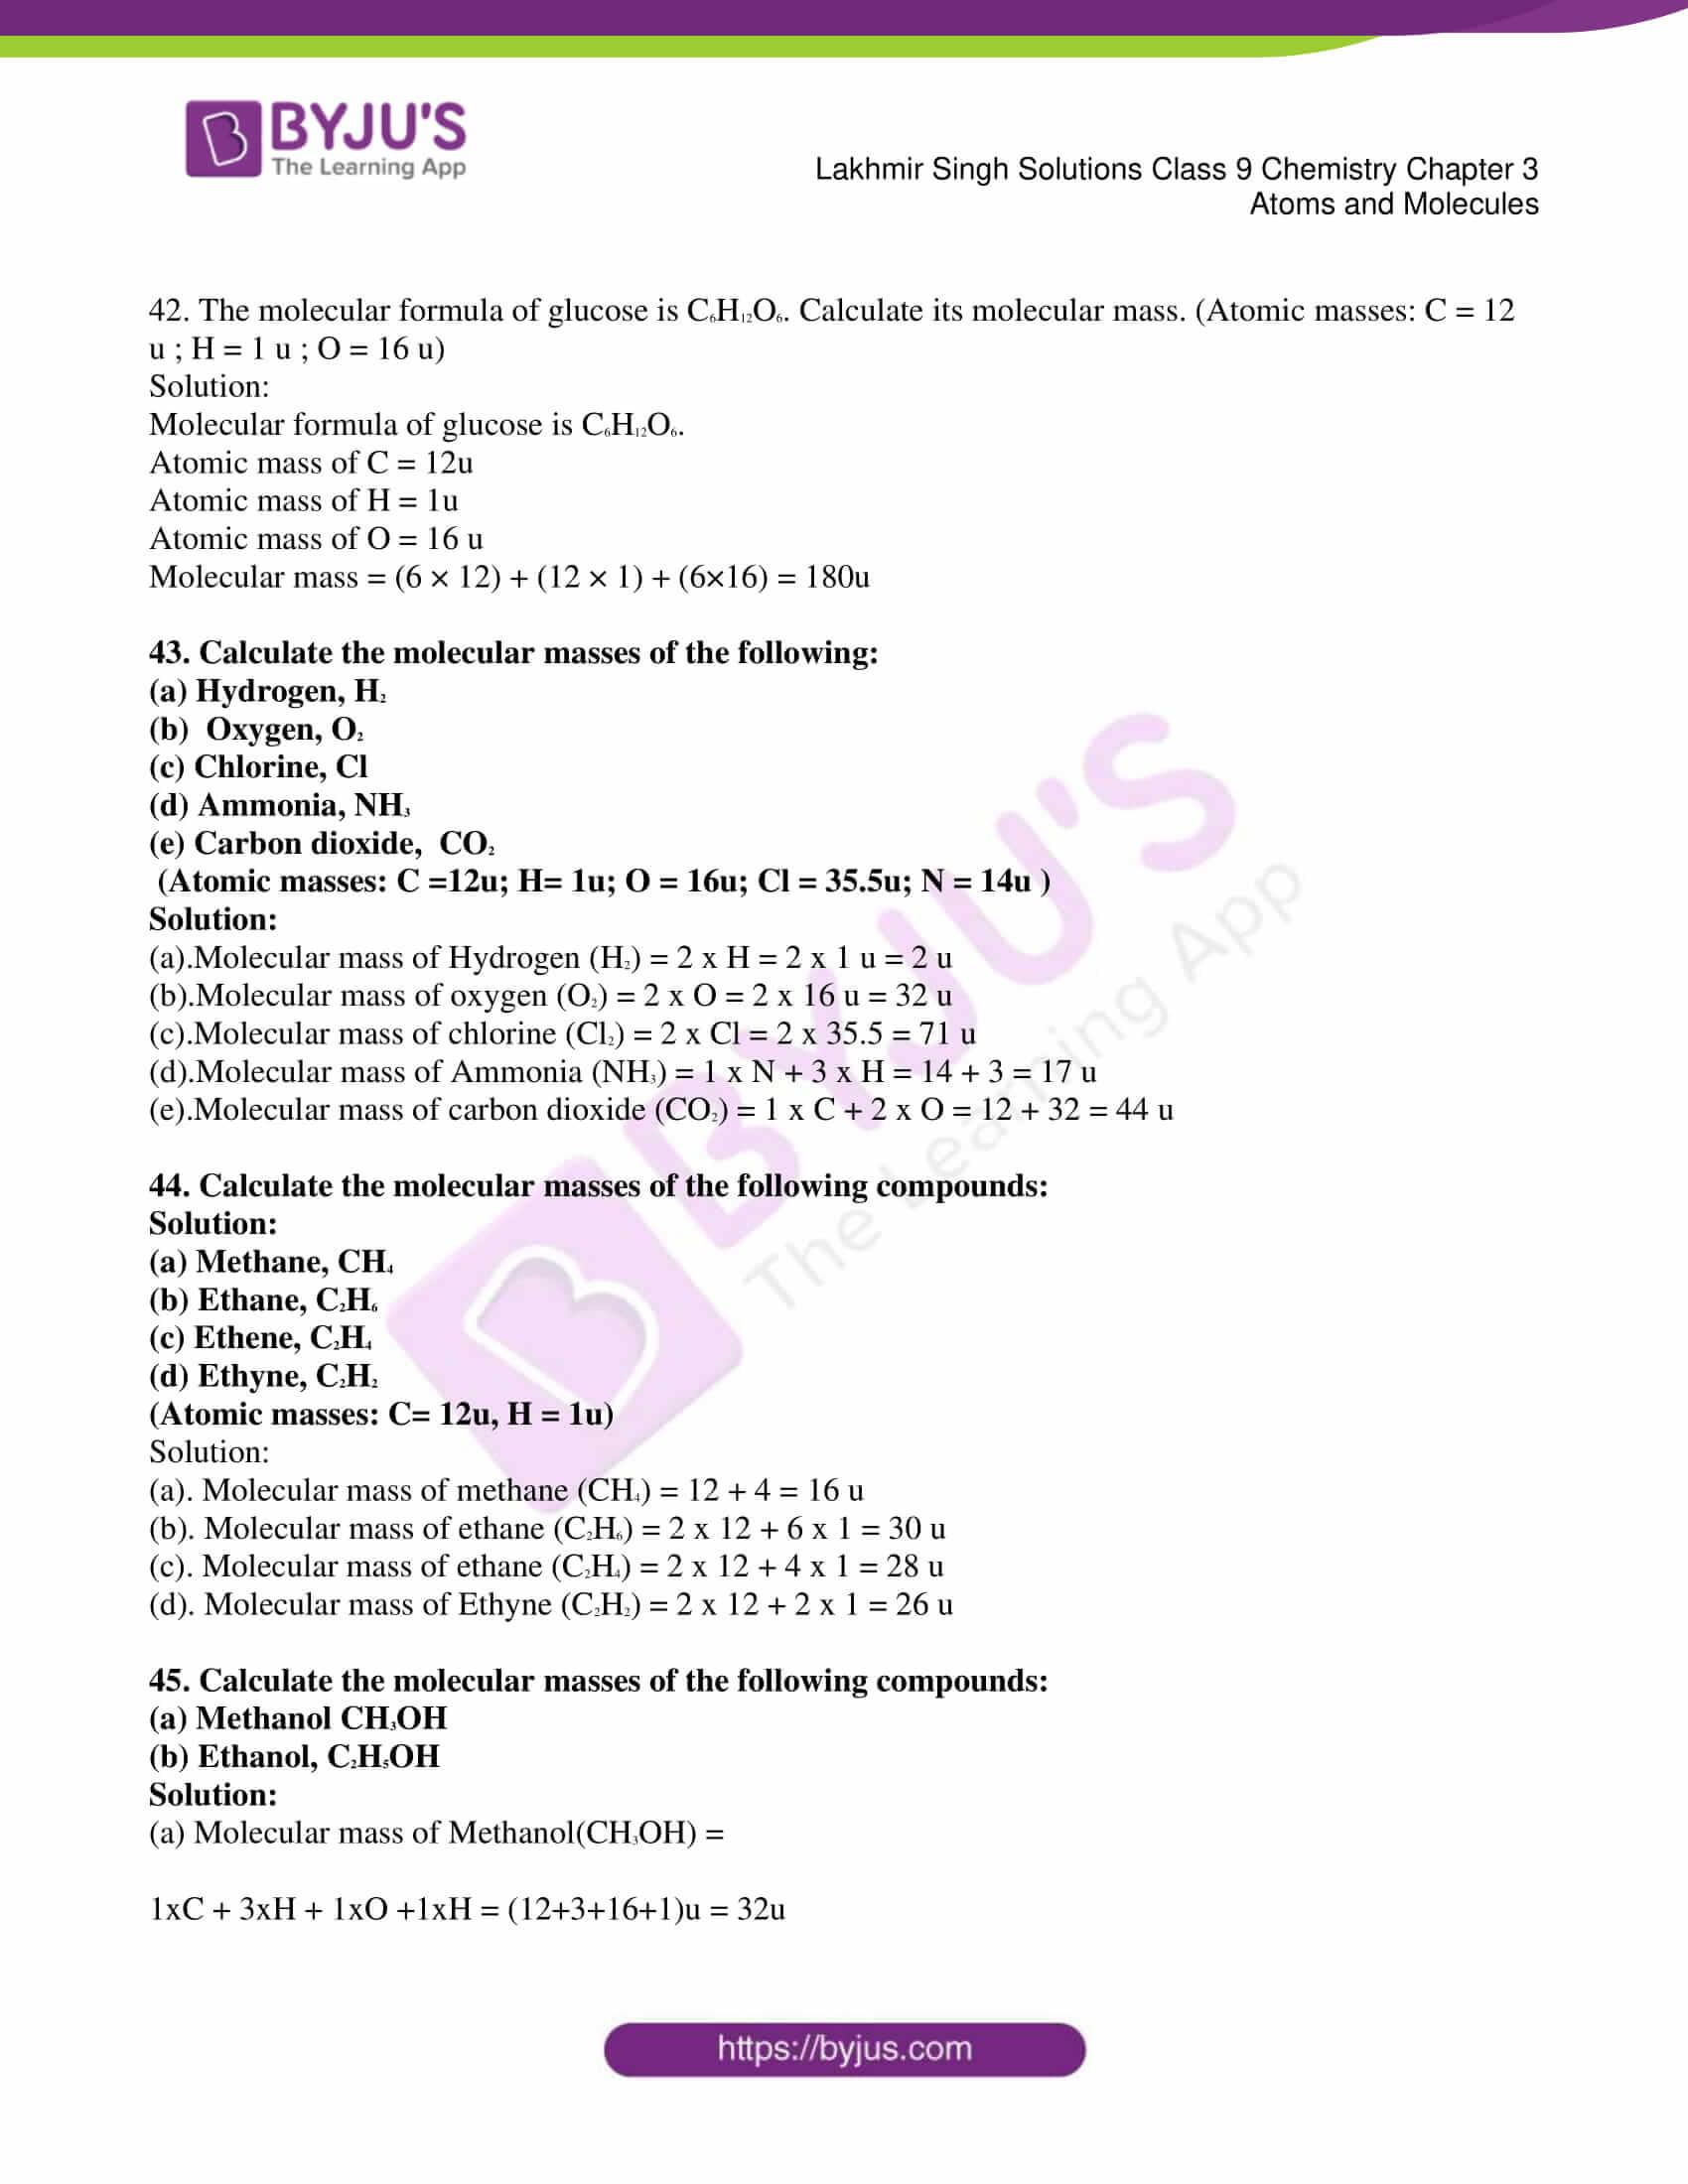 lakhmir singh solutions class 9 chemistry chapter 3 07